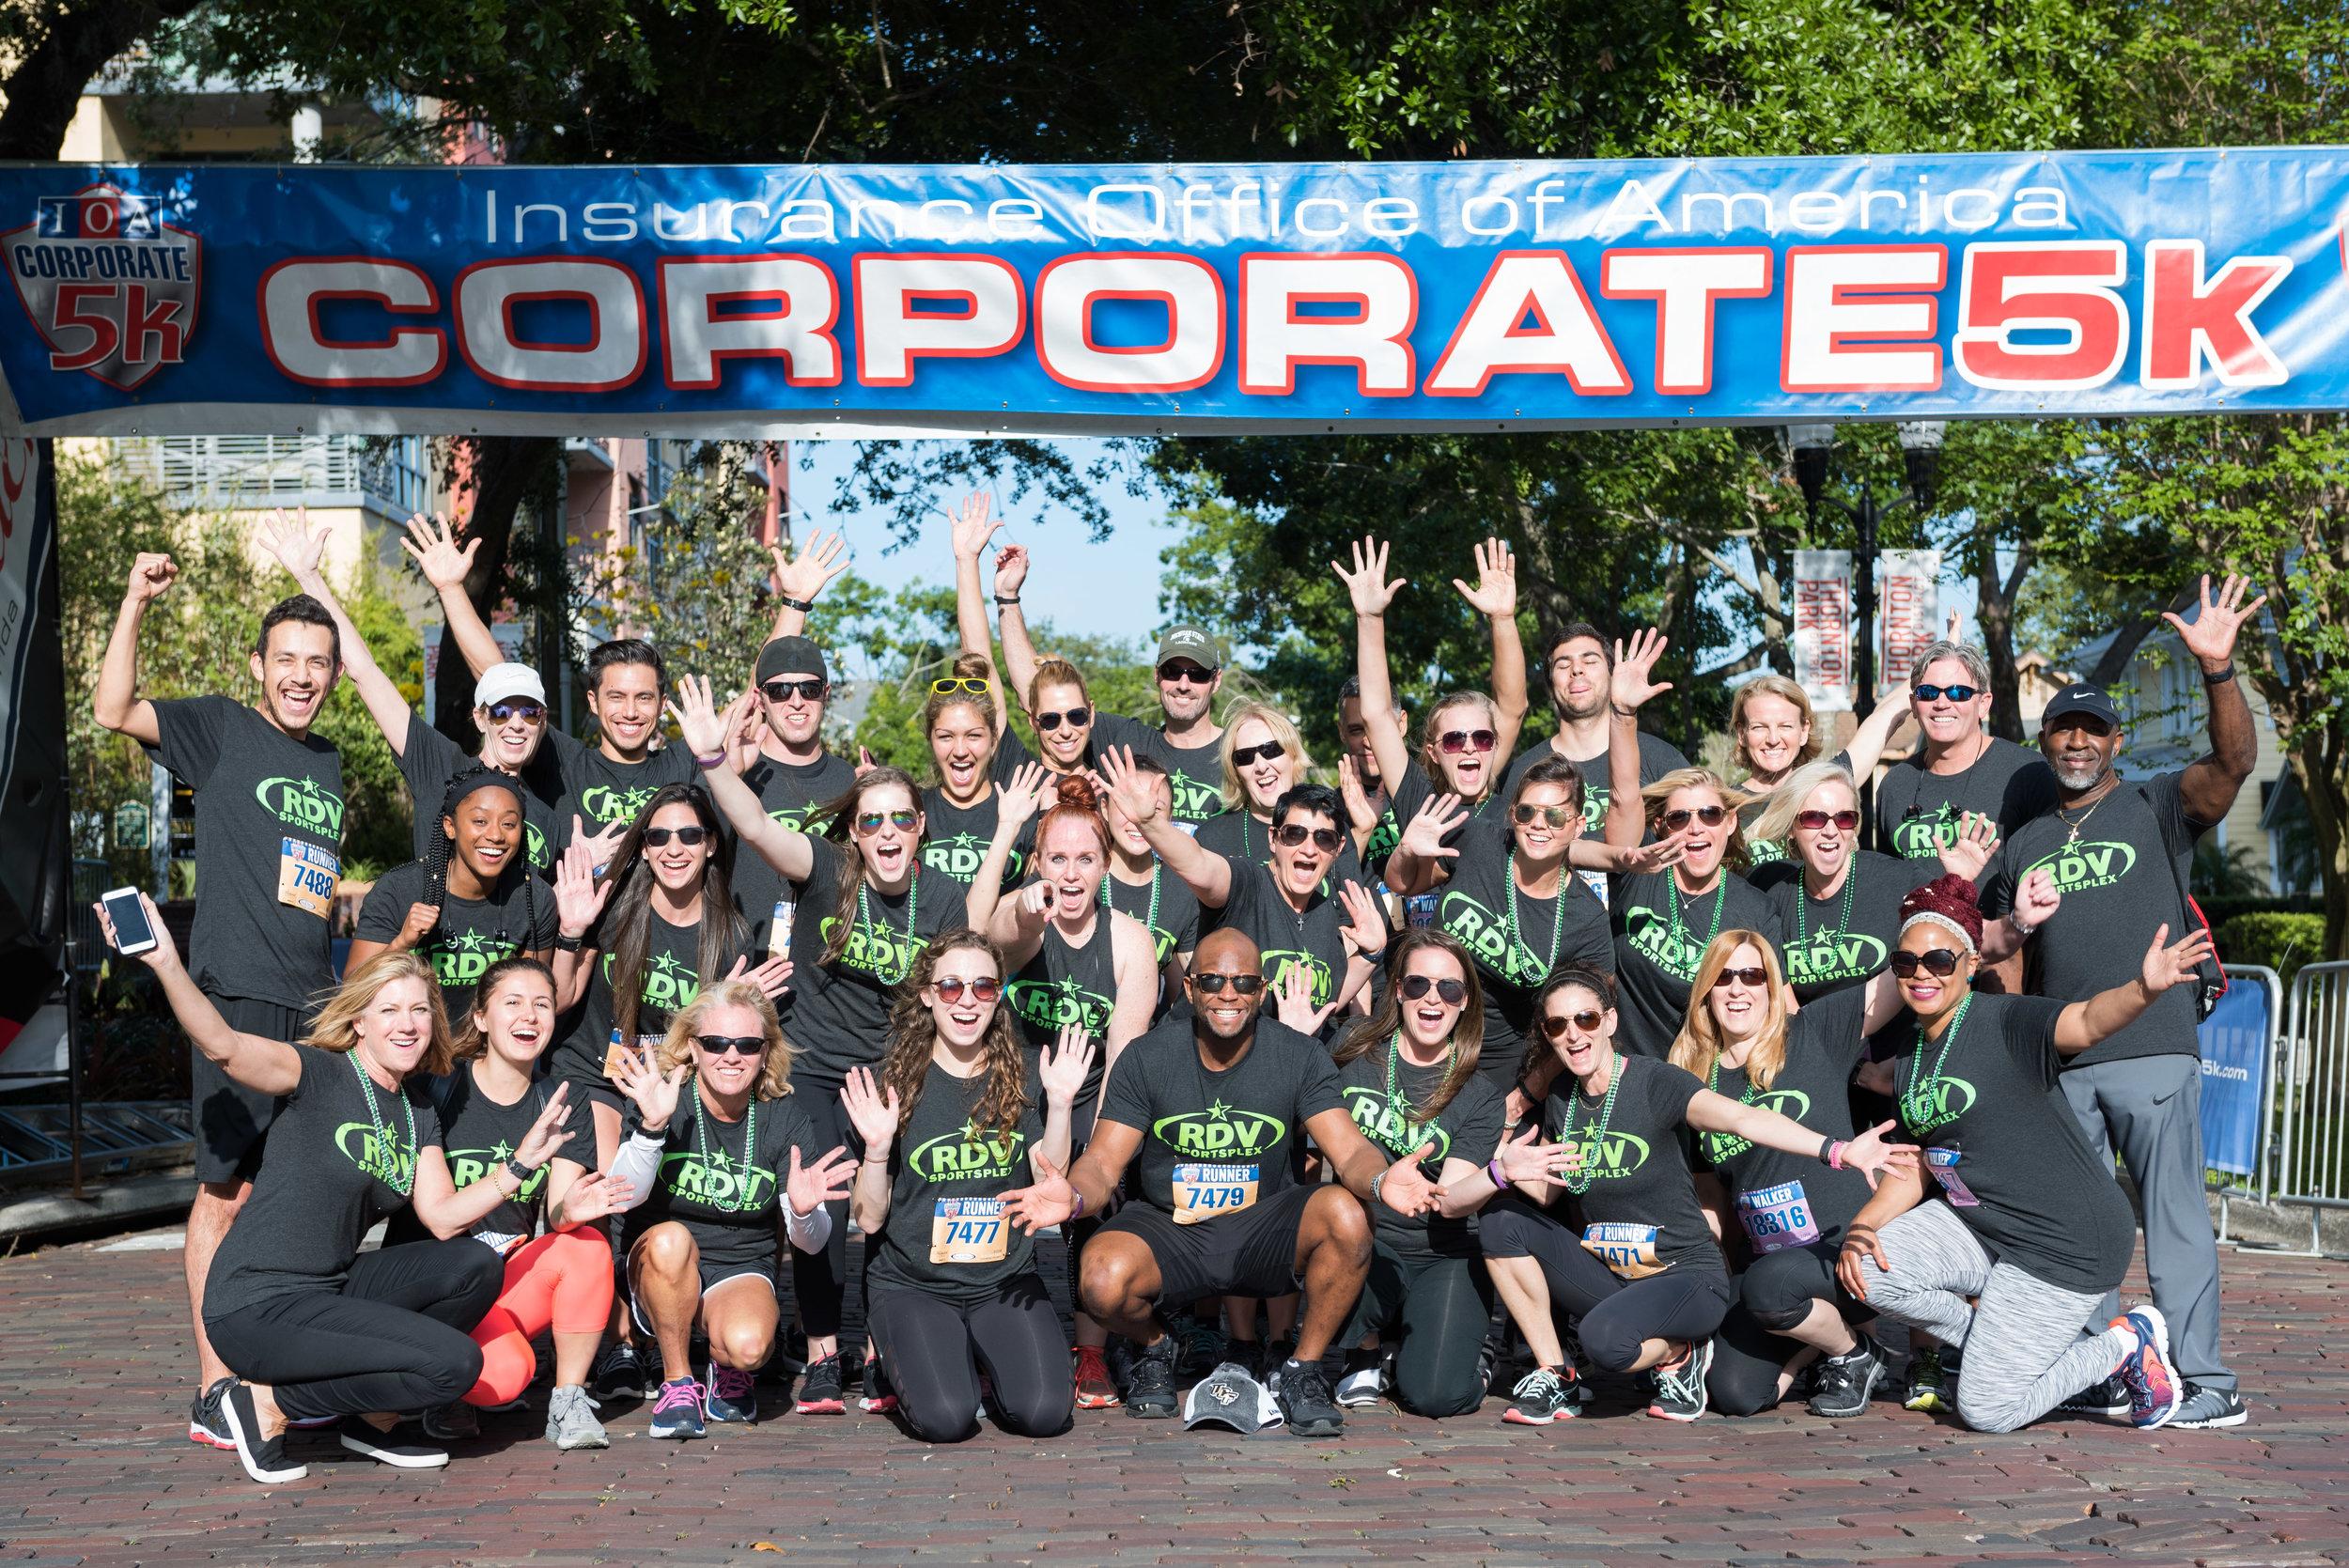 ios 5k corporate run at lake eola